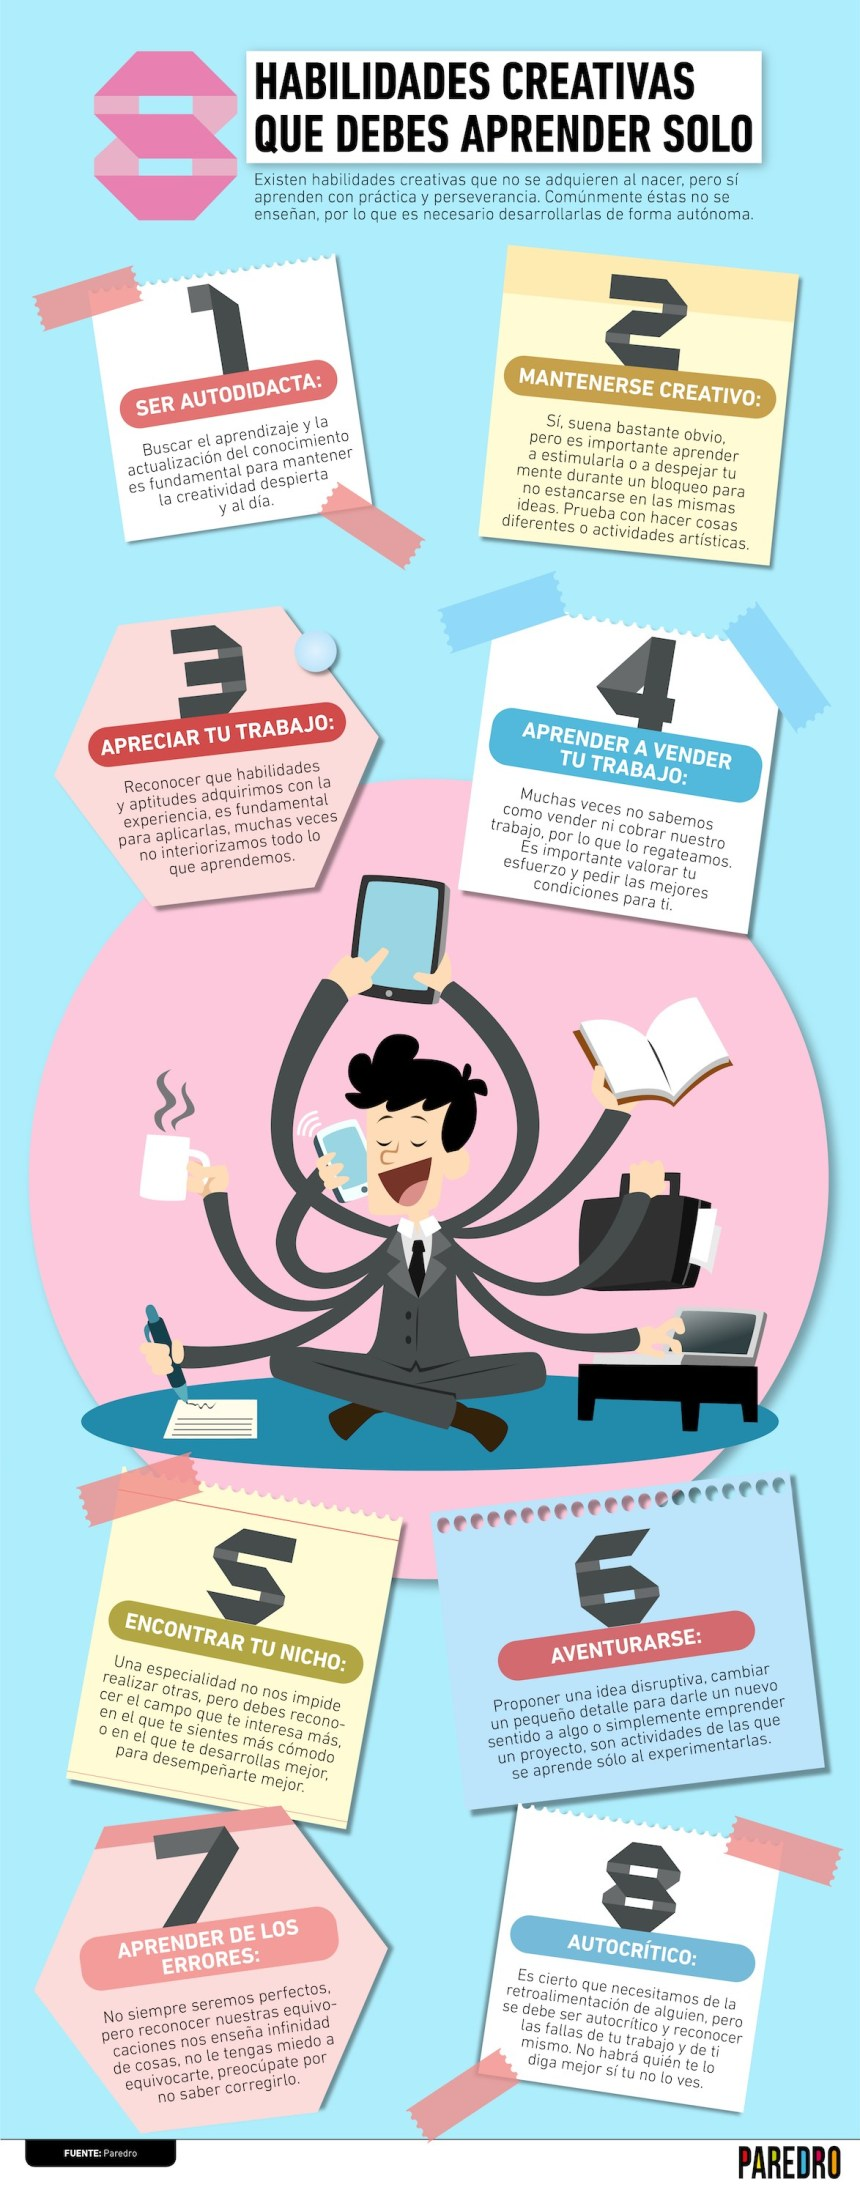 8 habilidades creativas que debes de aprender solo #infografia #infographic #design